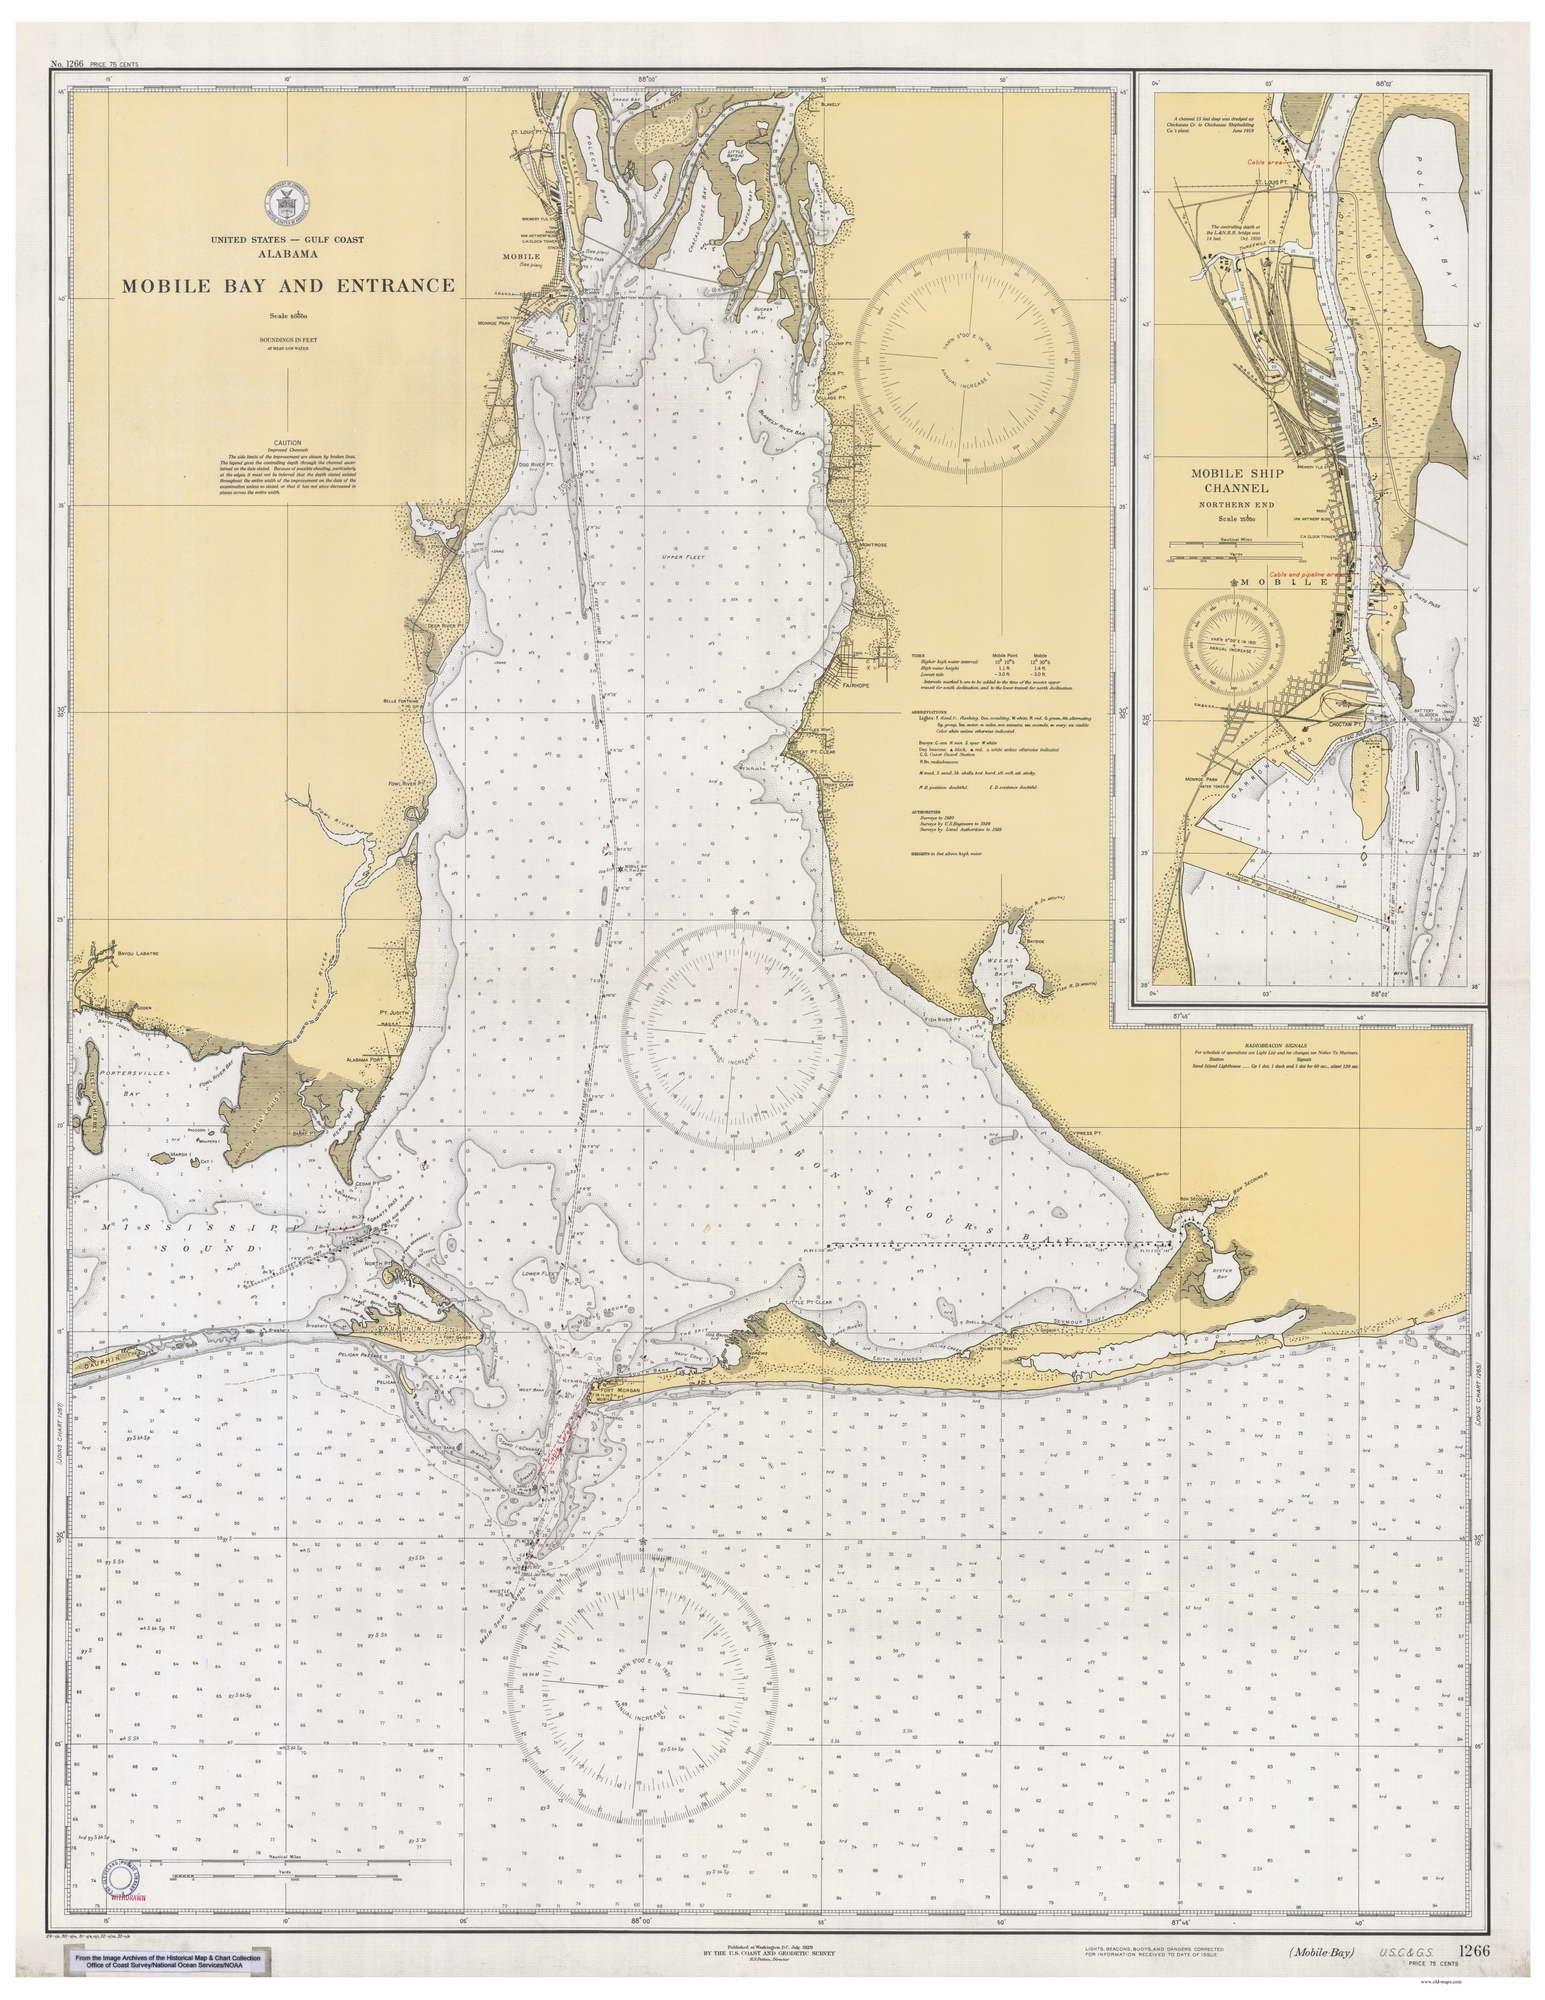 Mobile Bay 1933 Nautical Old Map Reprint - Alabama - Fairhope Bon Secour on